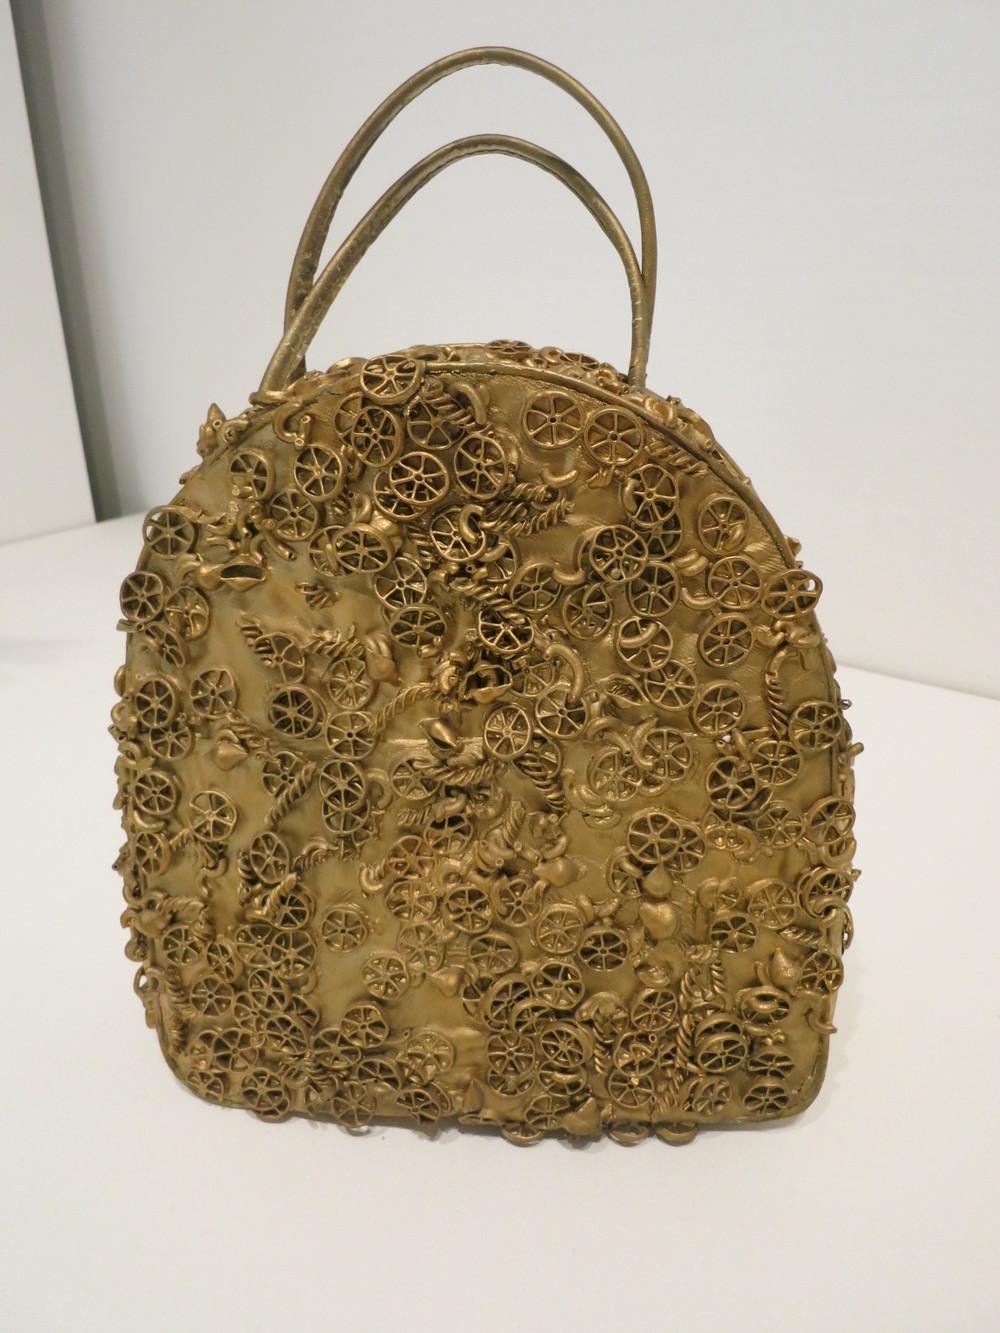 Yayou Kusama's 'Macaroni Bag' 1965